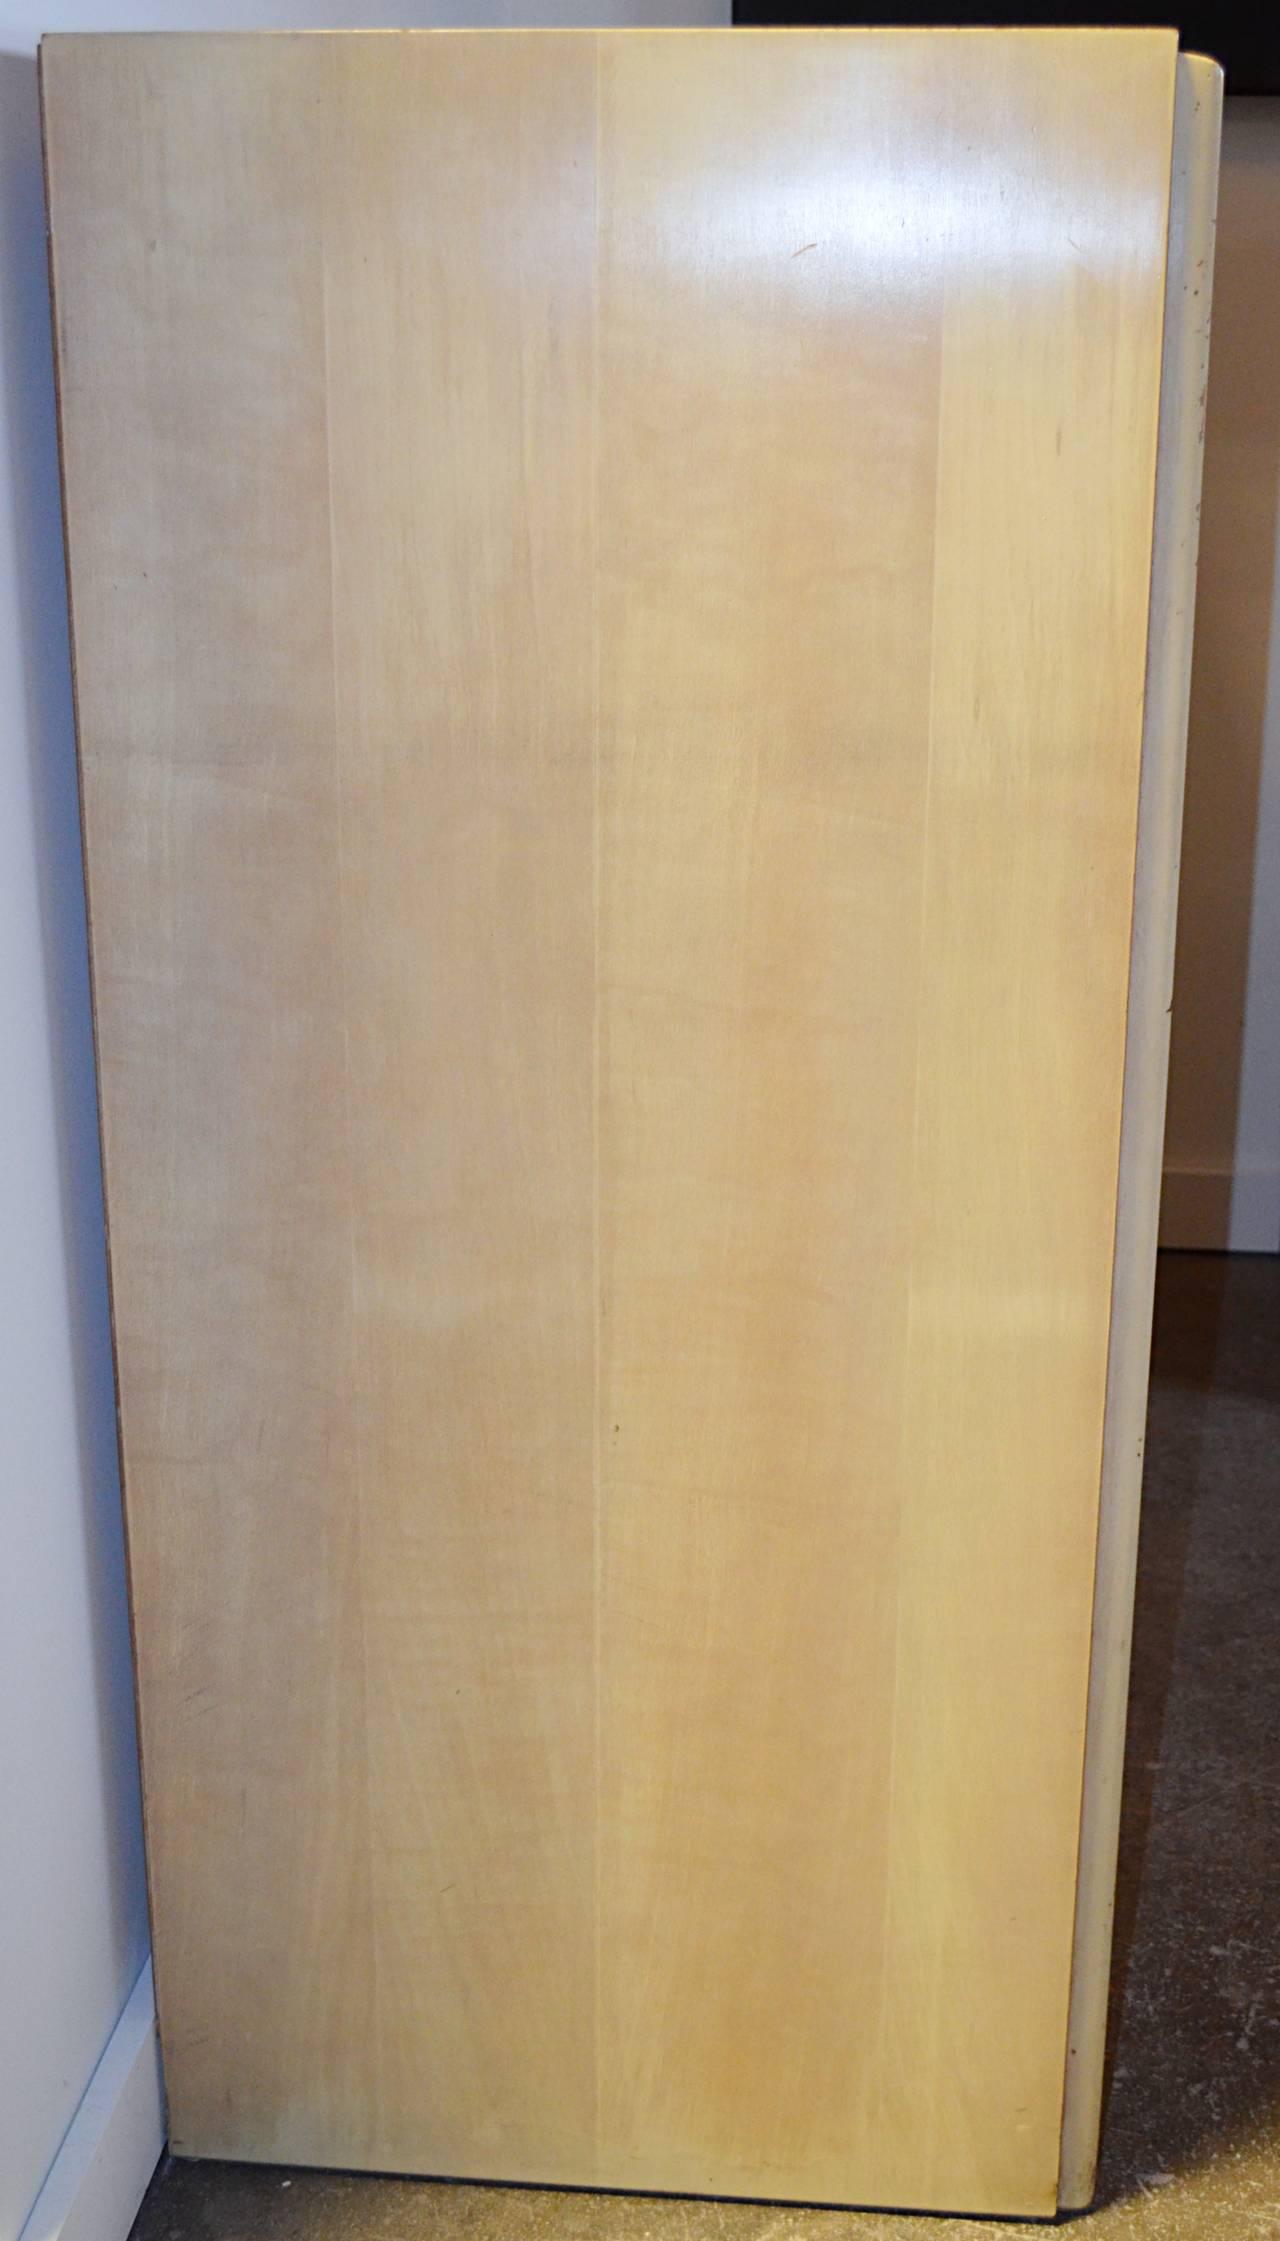 Gentleman's Chest Paul Frankl for Johnson Furniture Co. 3